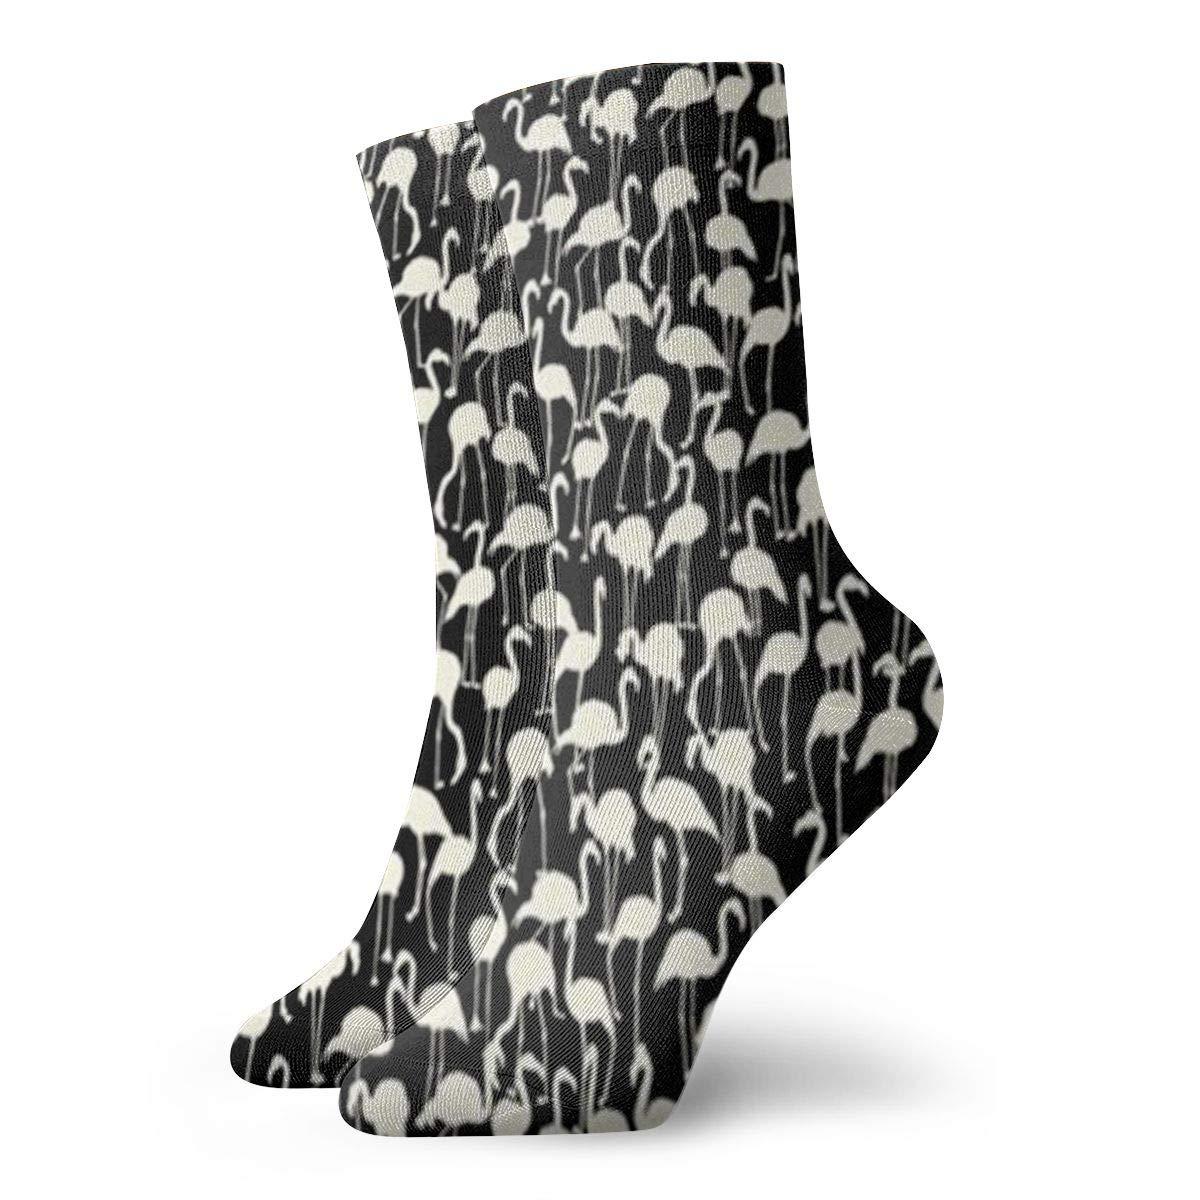 Flamingo Unisex Funny Casual Crew Socks Athletic Socks For Boys Girls Kids Teenagers